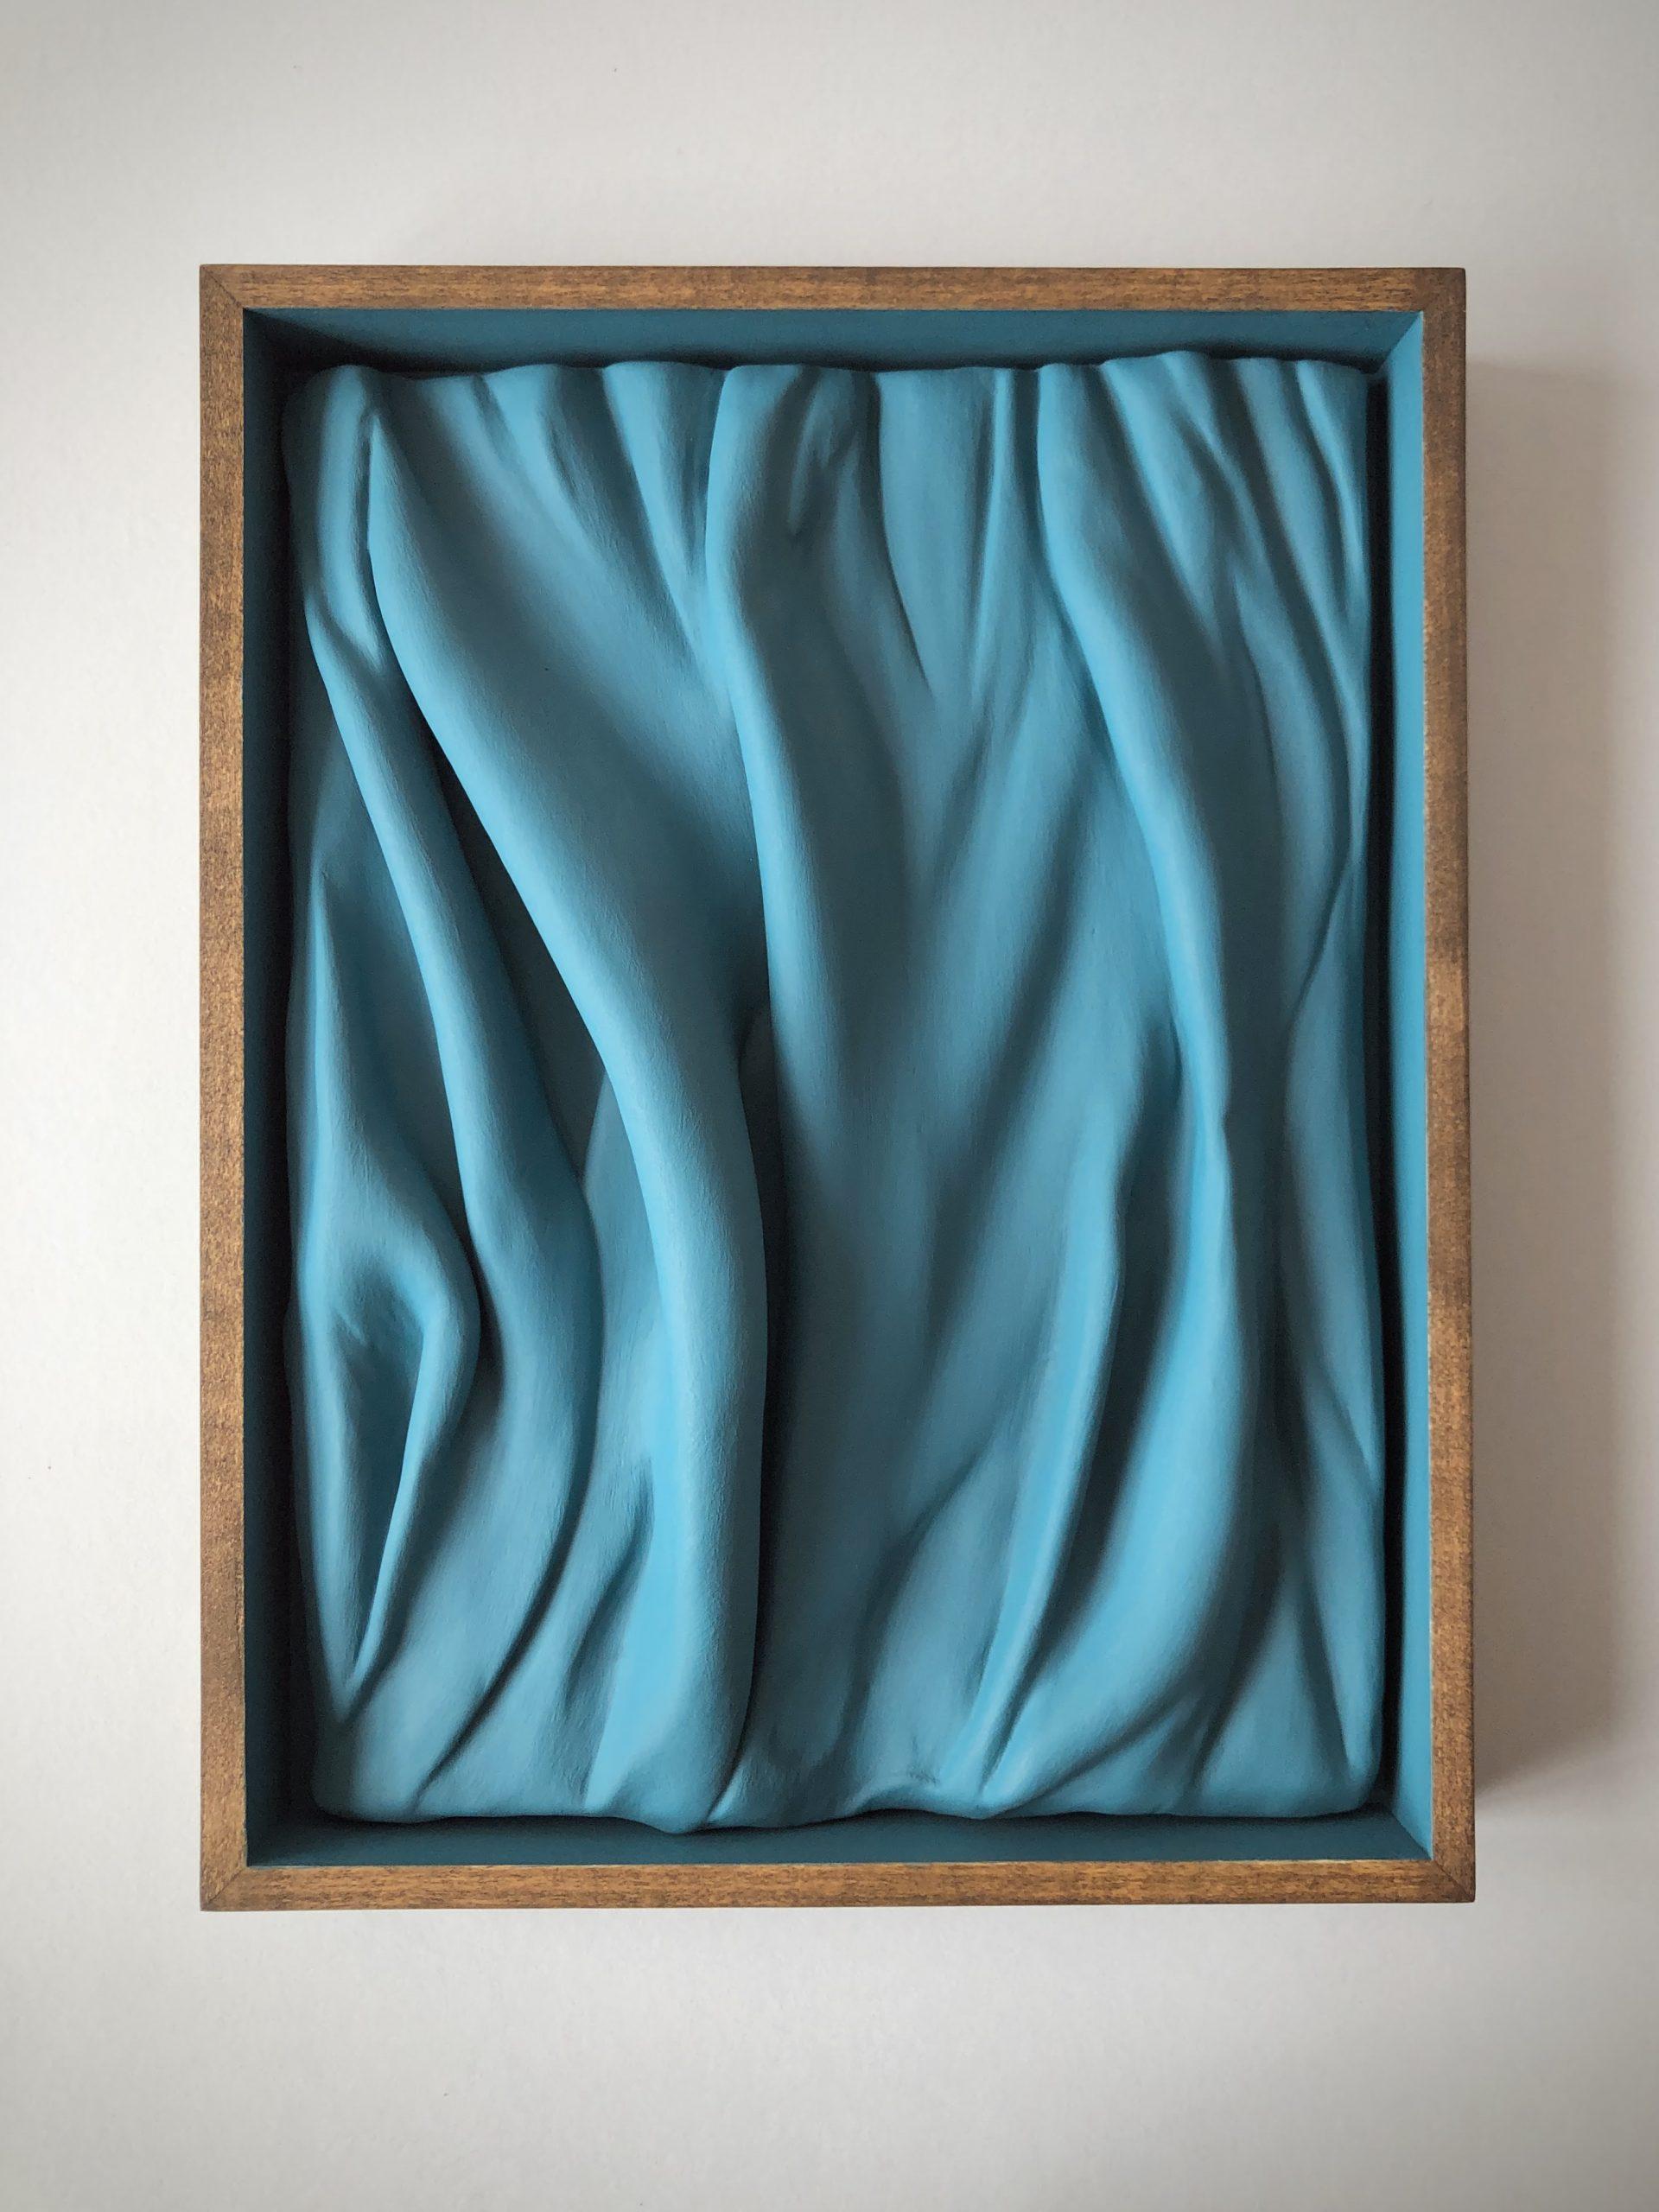 Richard Stone, lift not the painted veil iii (towards the marine blue sea), 2020 (34.5 x 27.5 x 5 cm) FAD magazine